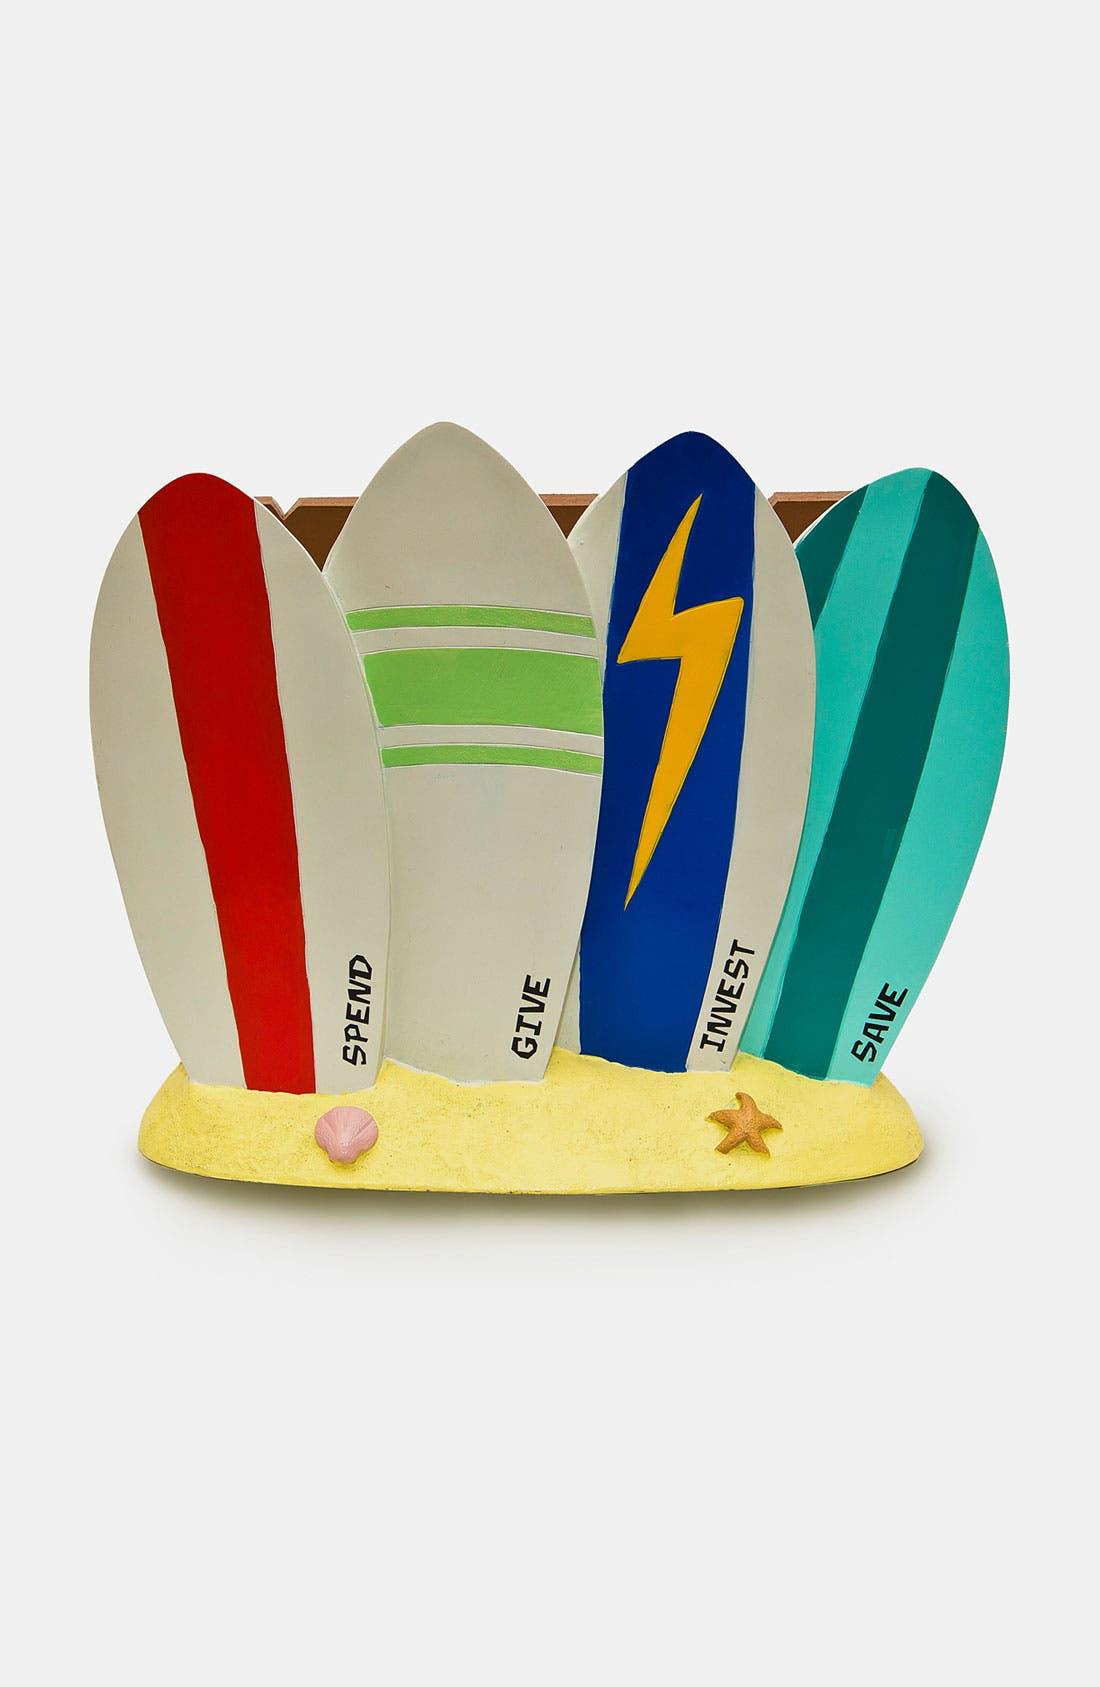 Main Image - Money Scholar Surf Savings Bank